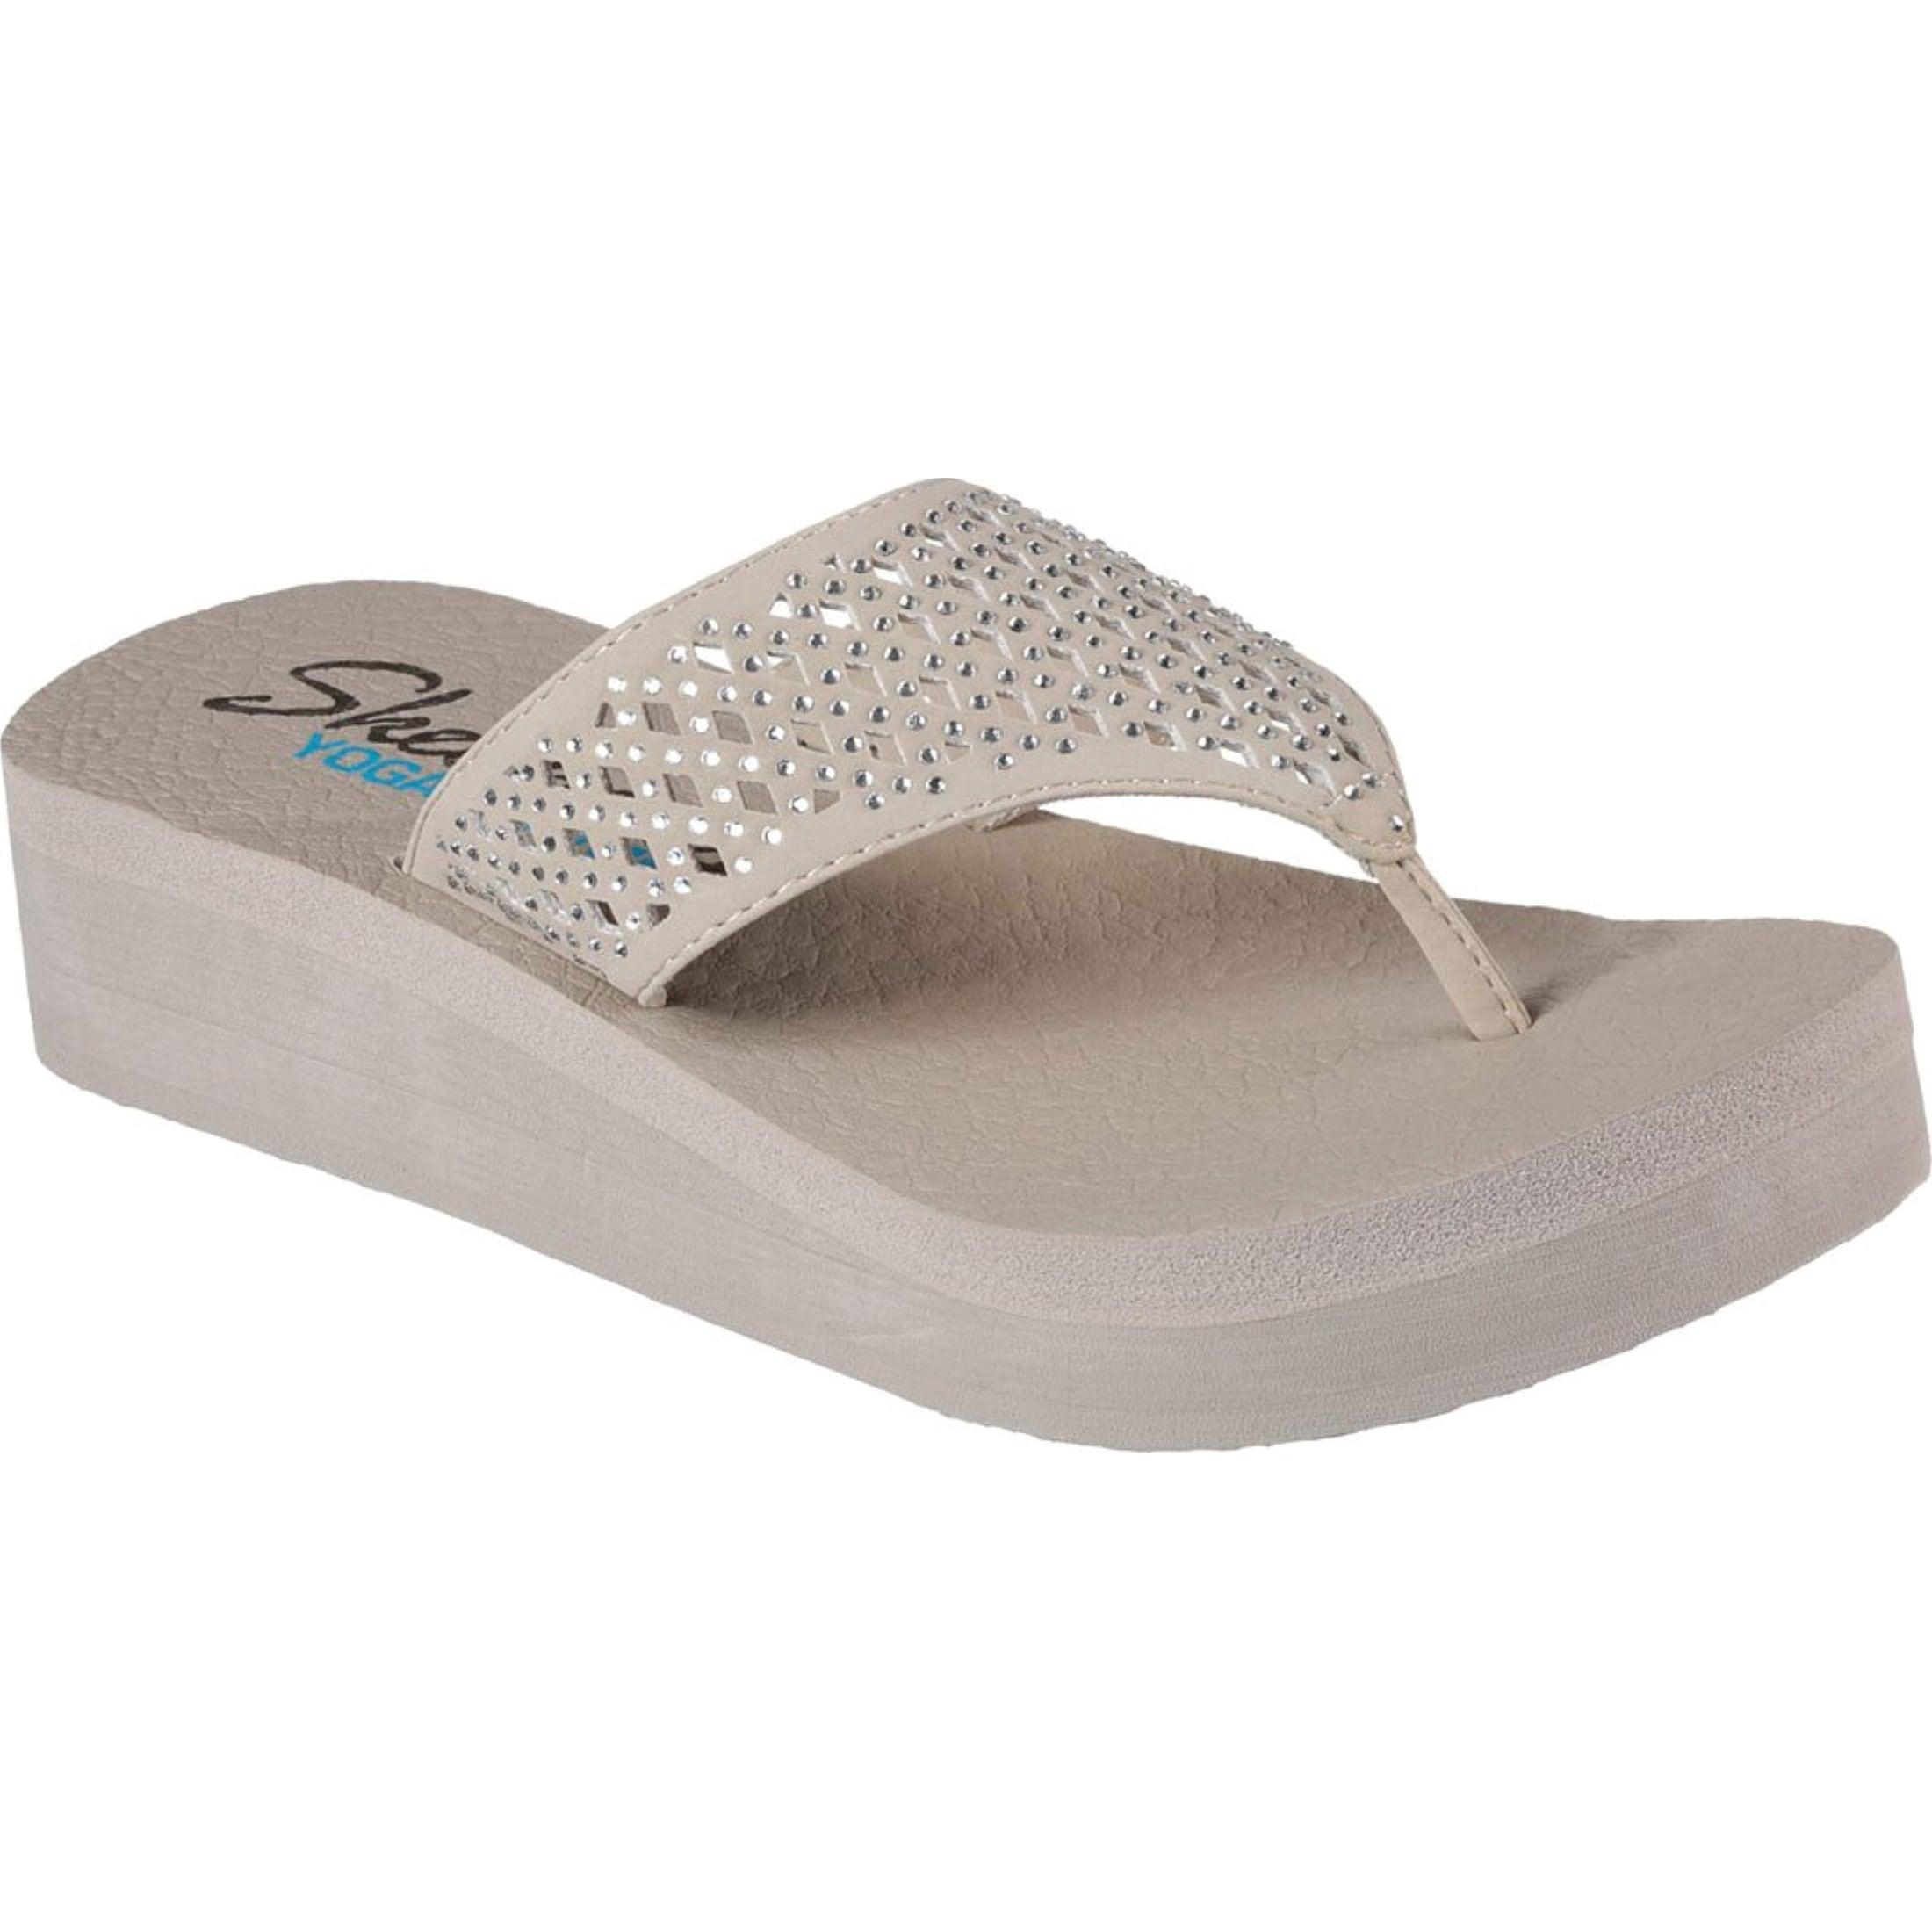 be8382c15 Shop Skechers Womens Vinyasa Flow Wedge Lightweight Memory Foam Flip ...  skechers memory foam